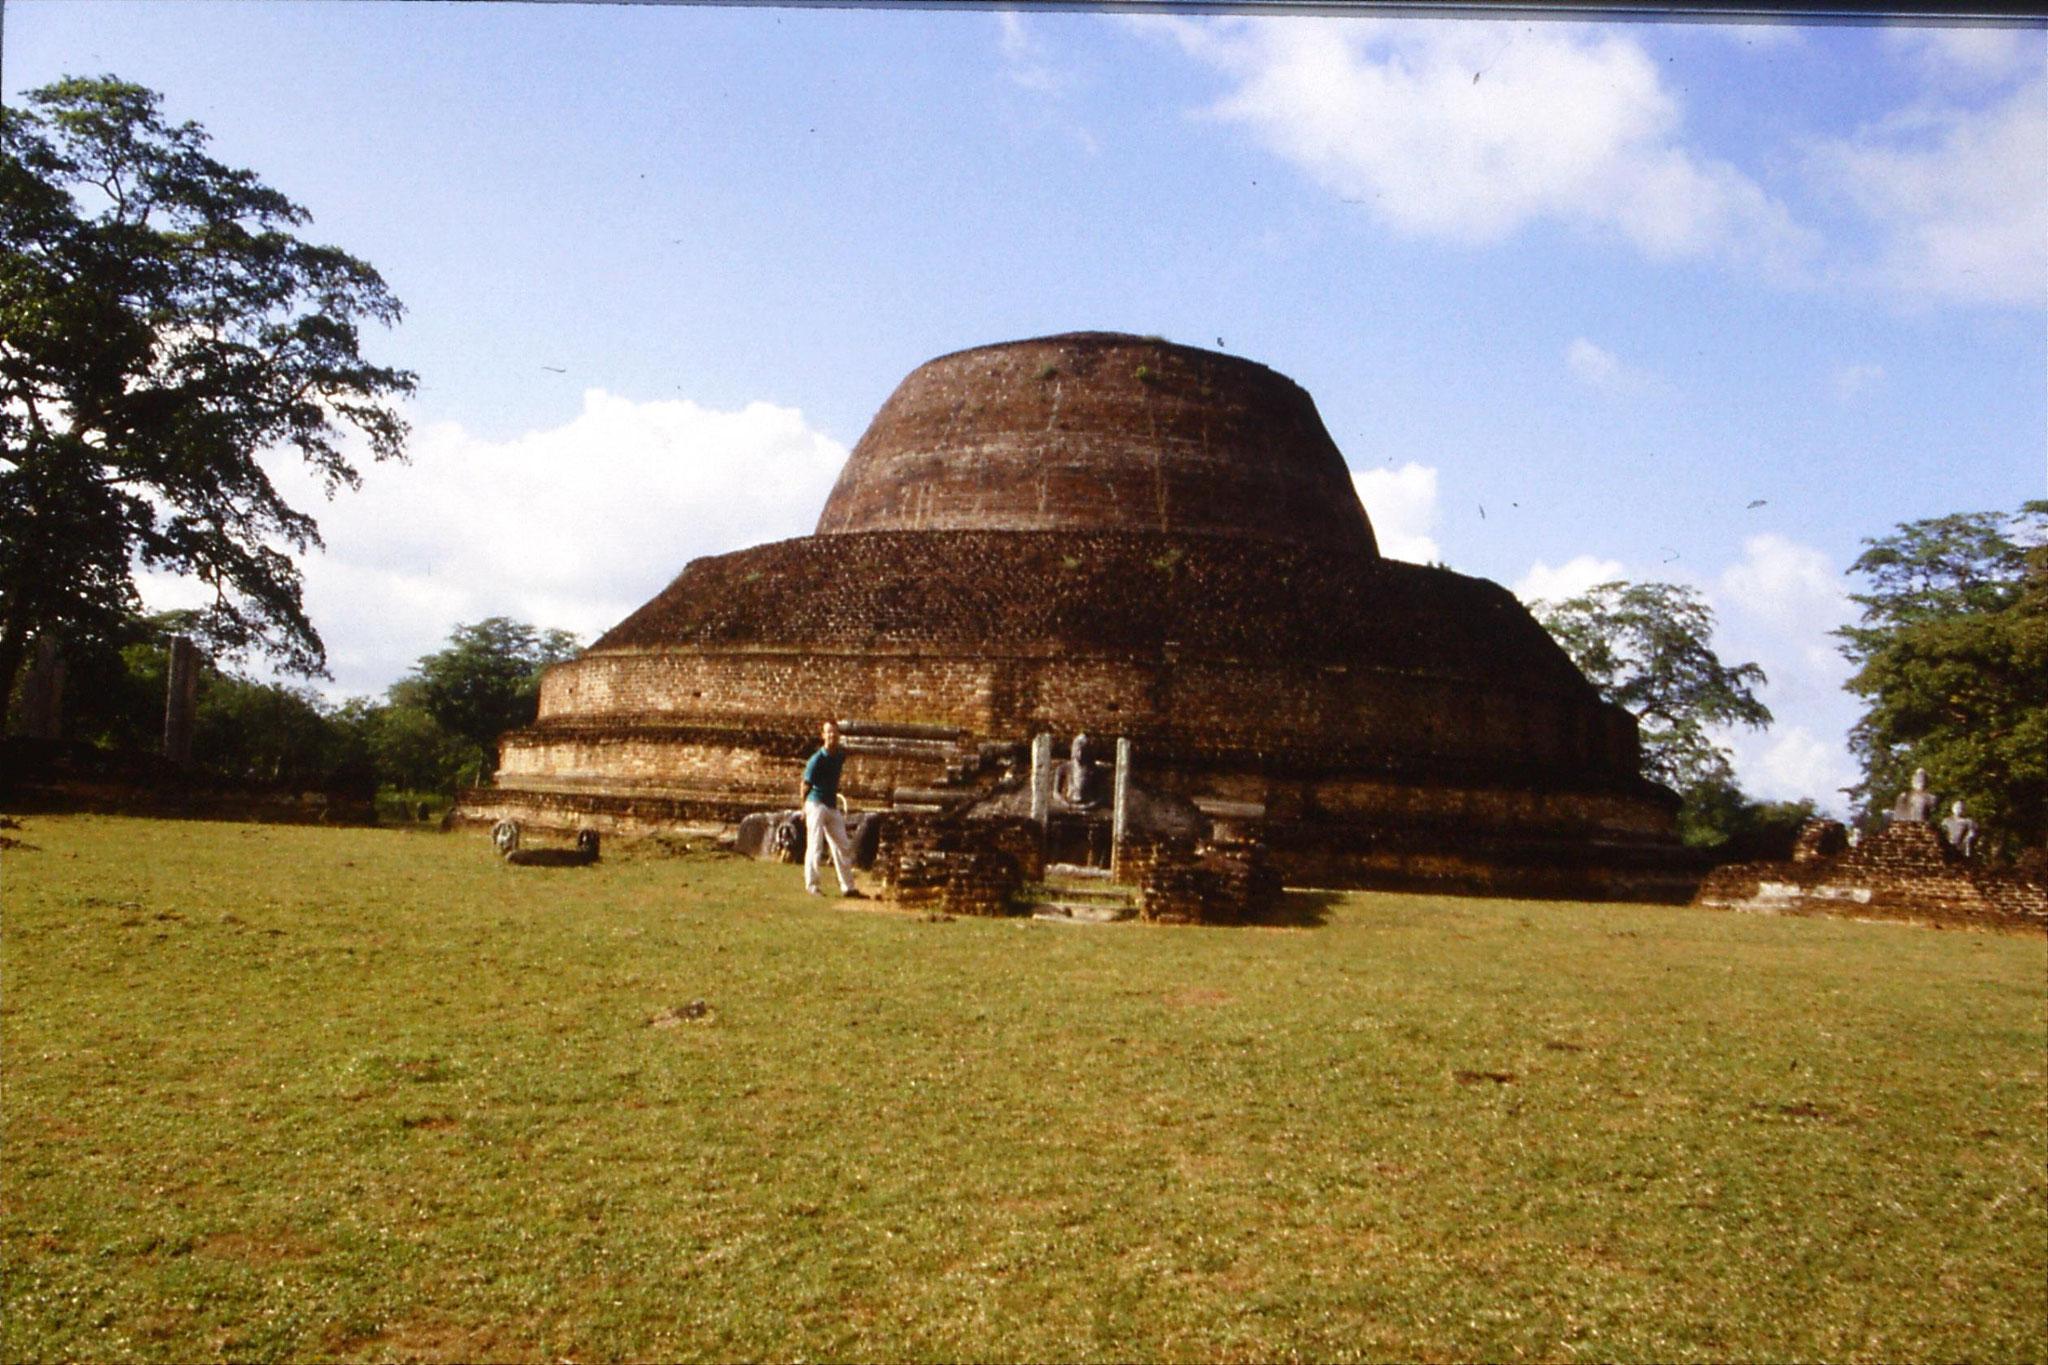 102/34: 7/2/1990 Polonnarua - Pabula Vihara - dagoba